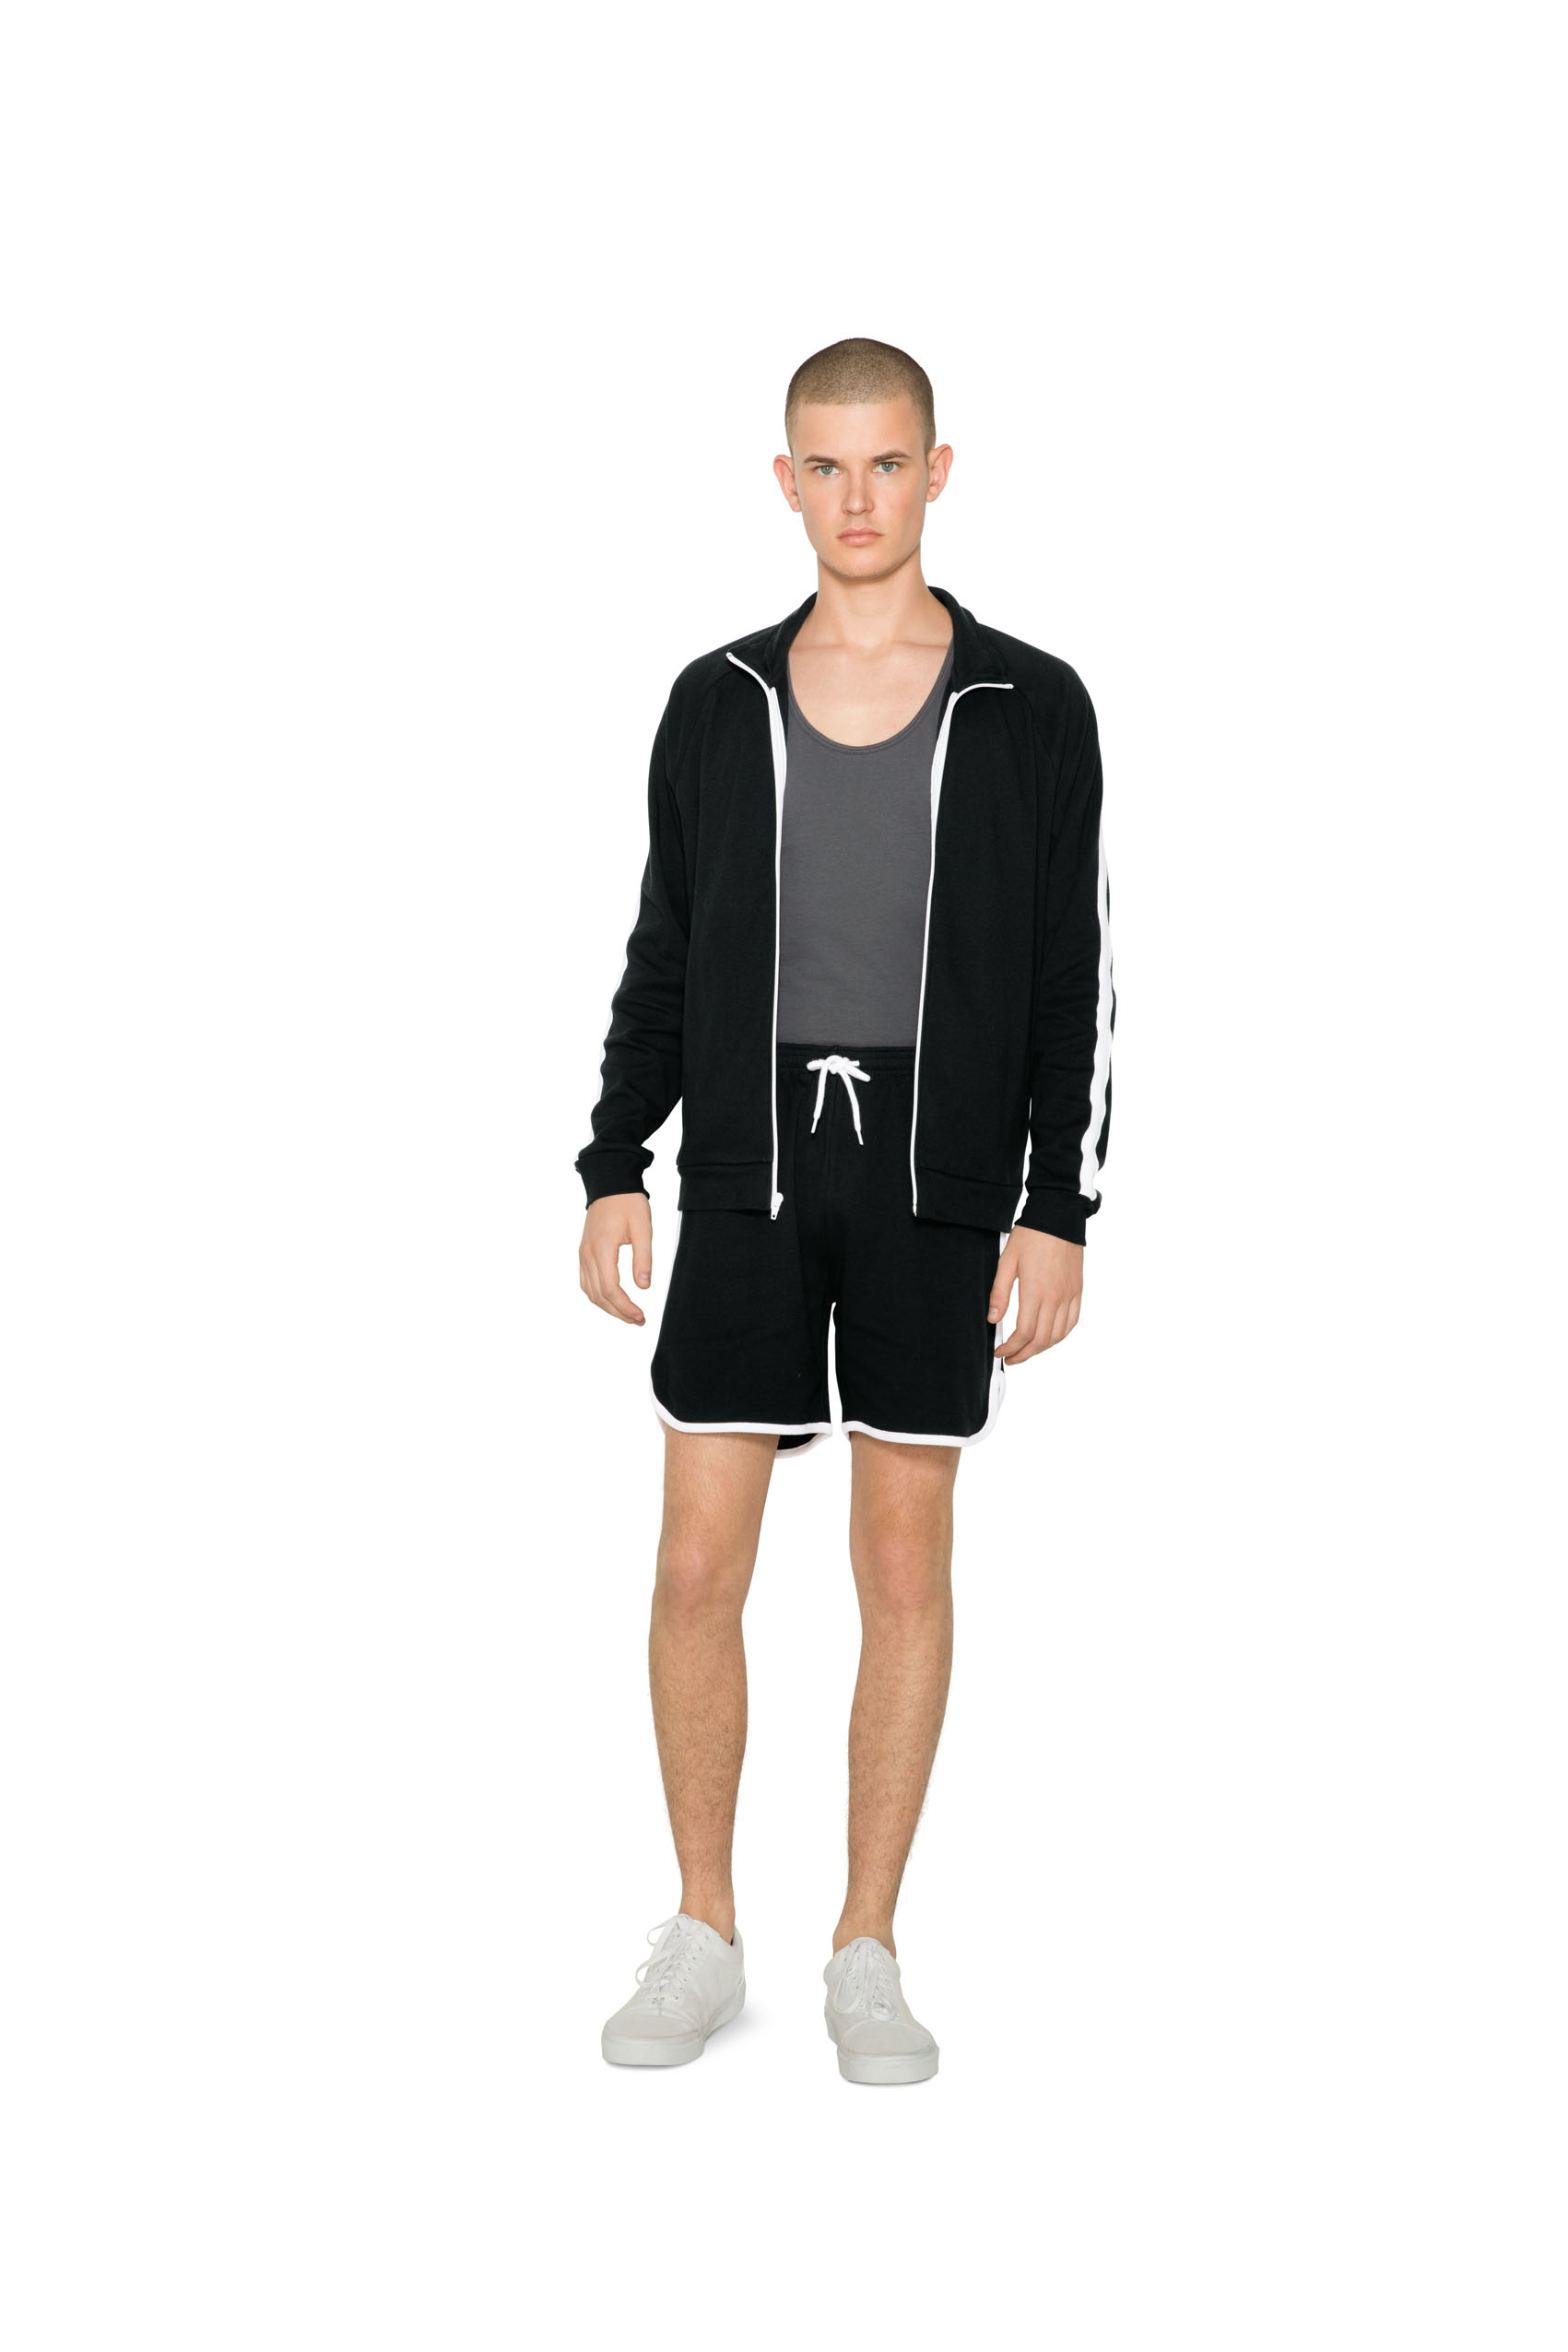 AMA Interlock basketball shorts For Him